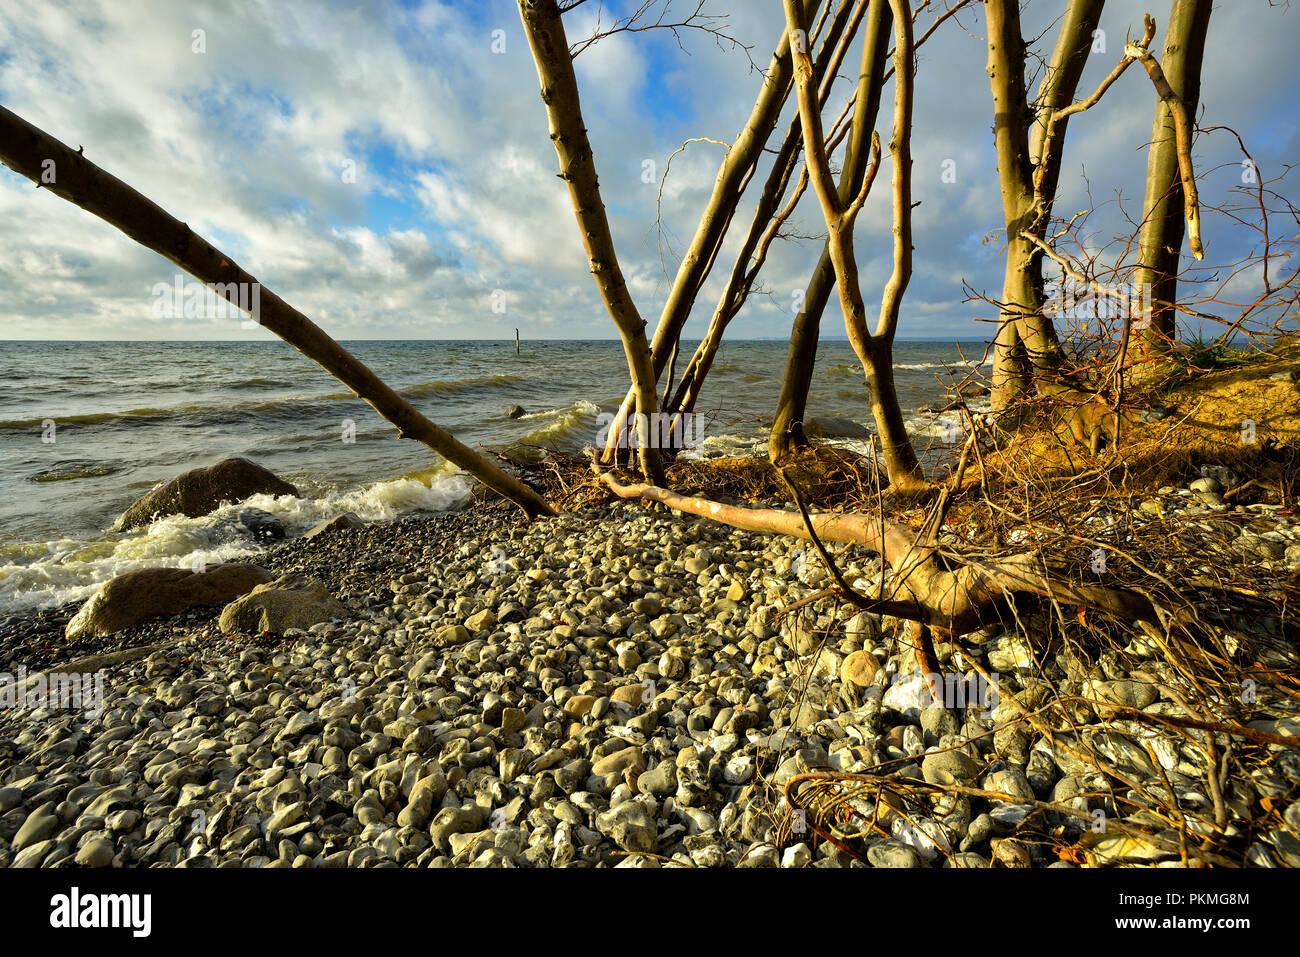 Coastal erosion on the shores of the Baltic Sea, free-flown beech trees on the stone beach, Jasmund National Park, Rügen Island - Stock Image